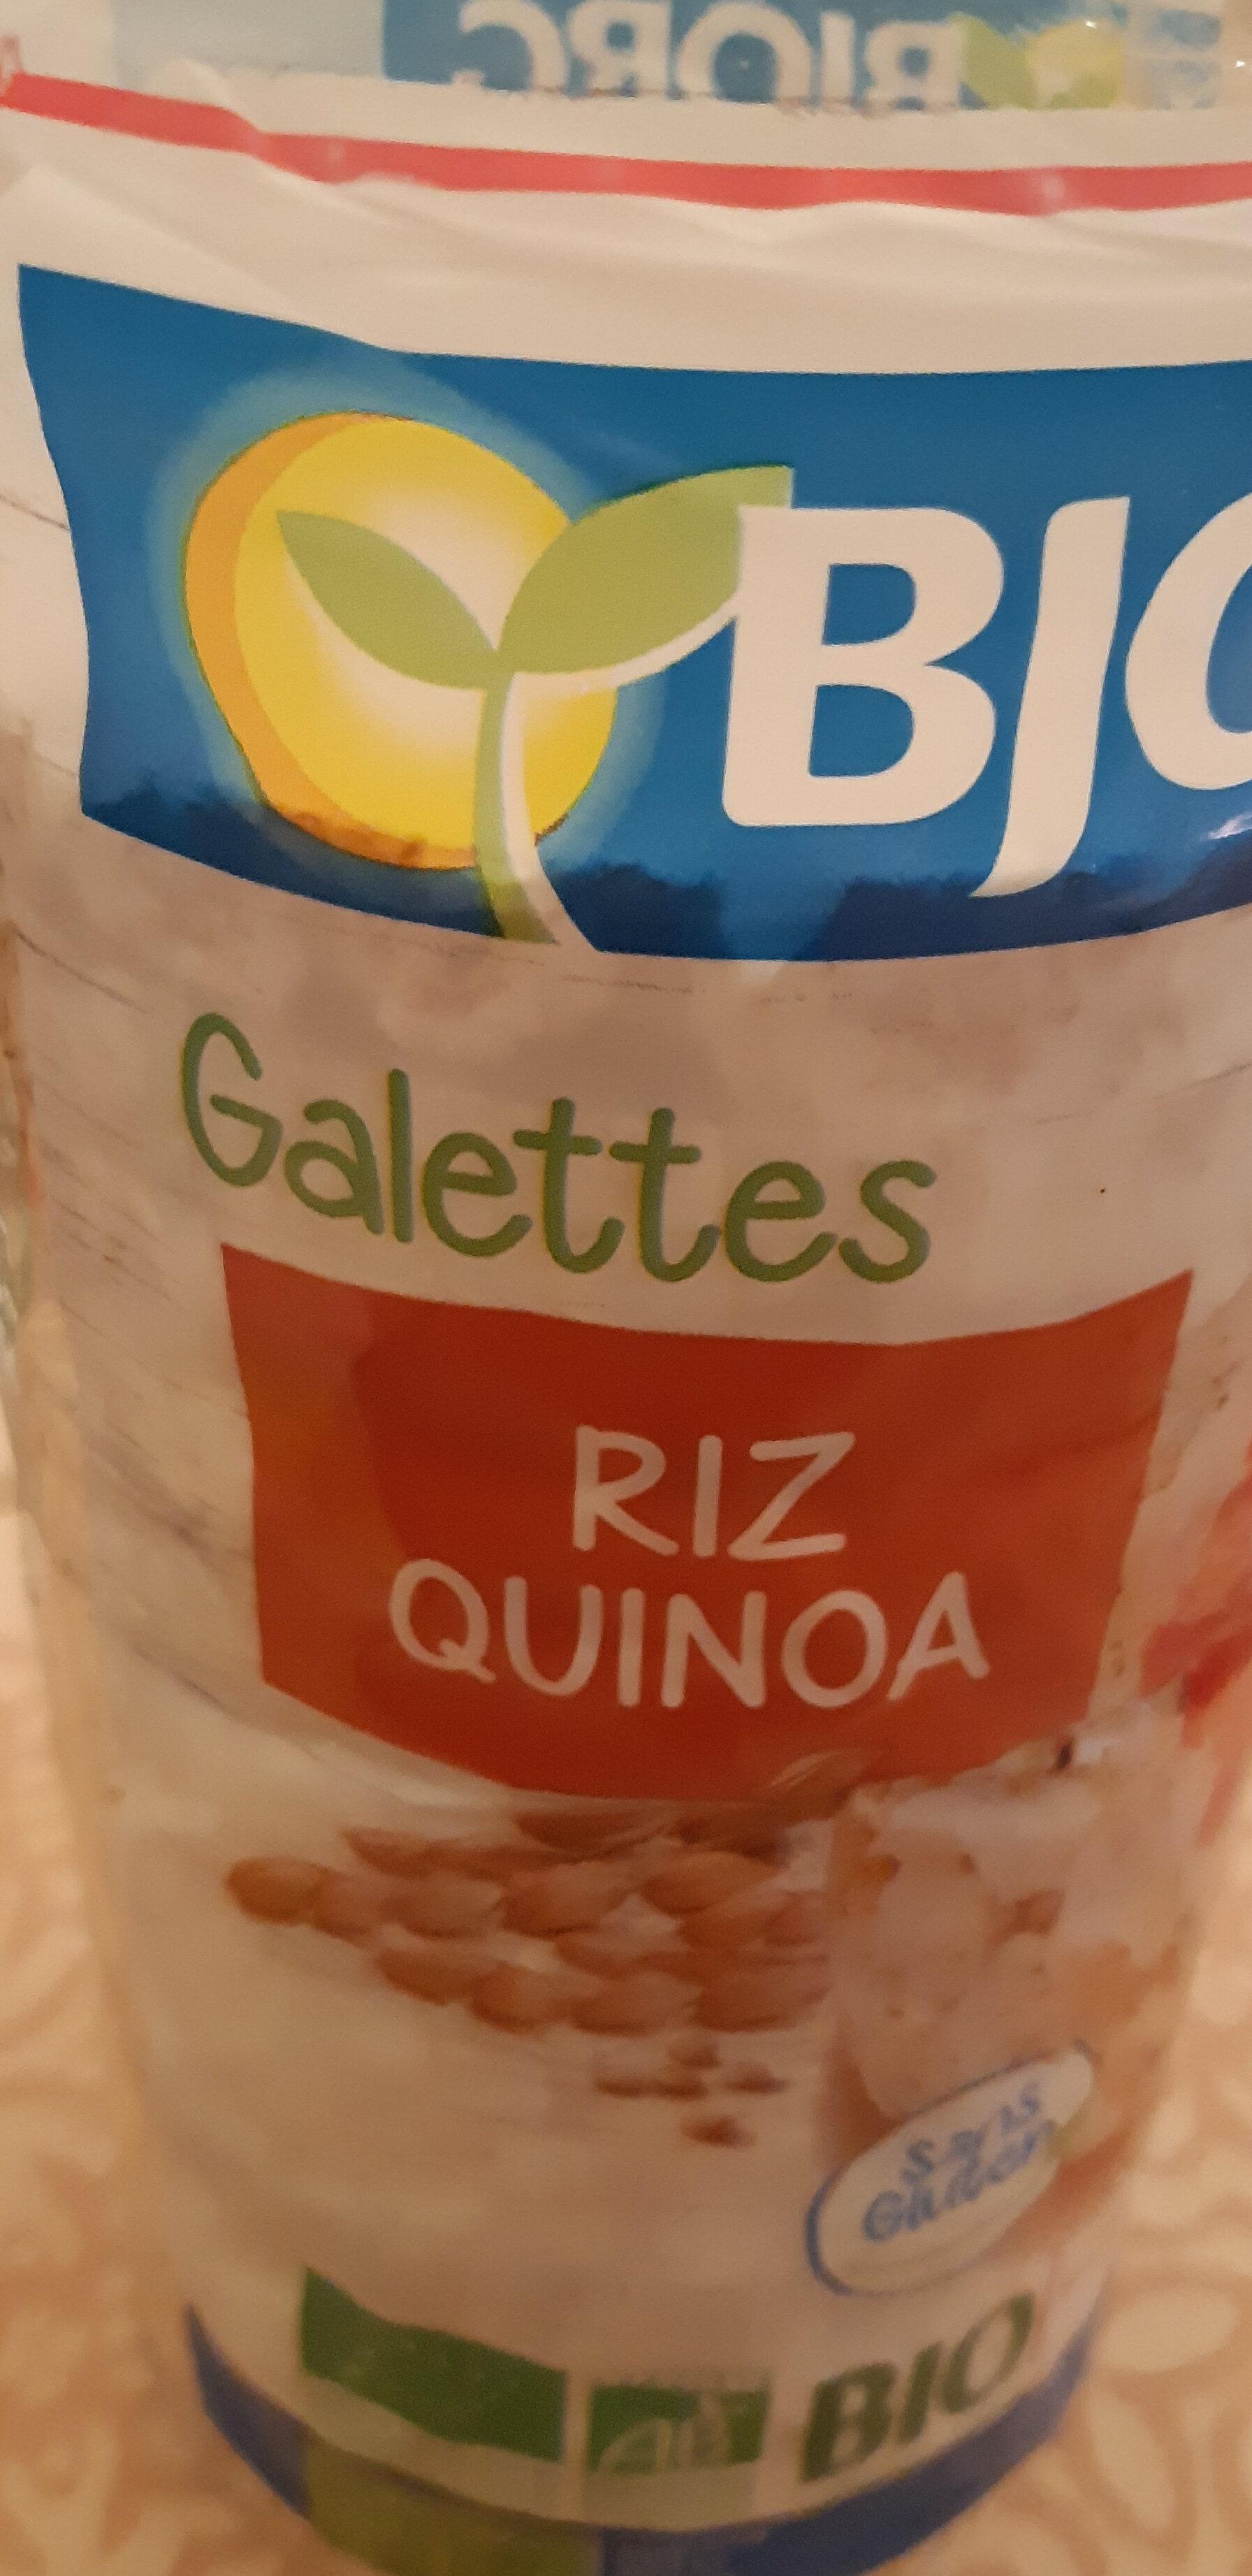 galette riz - Product - fr